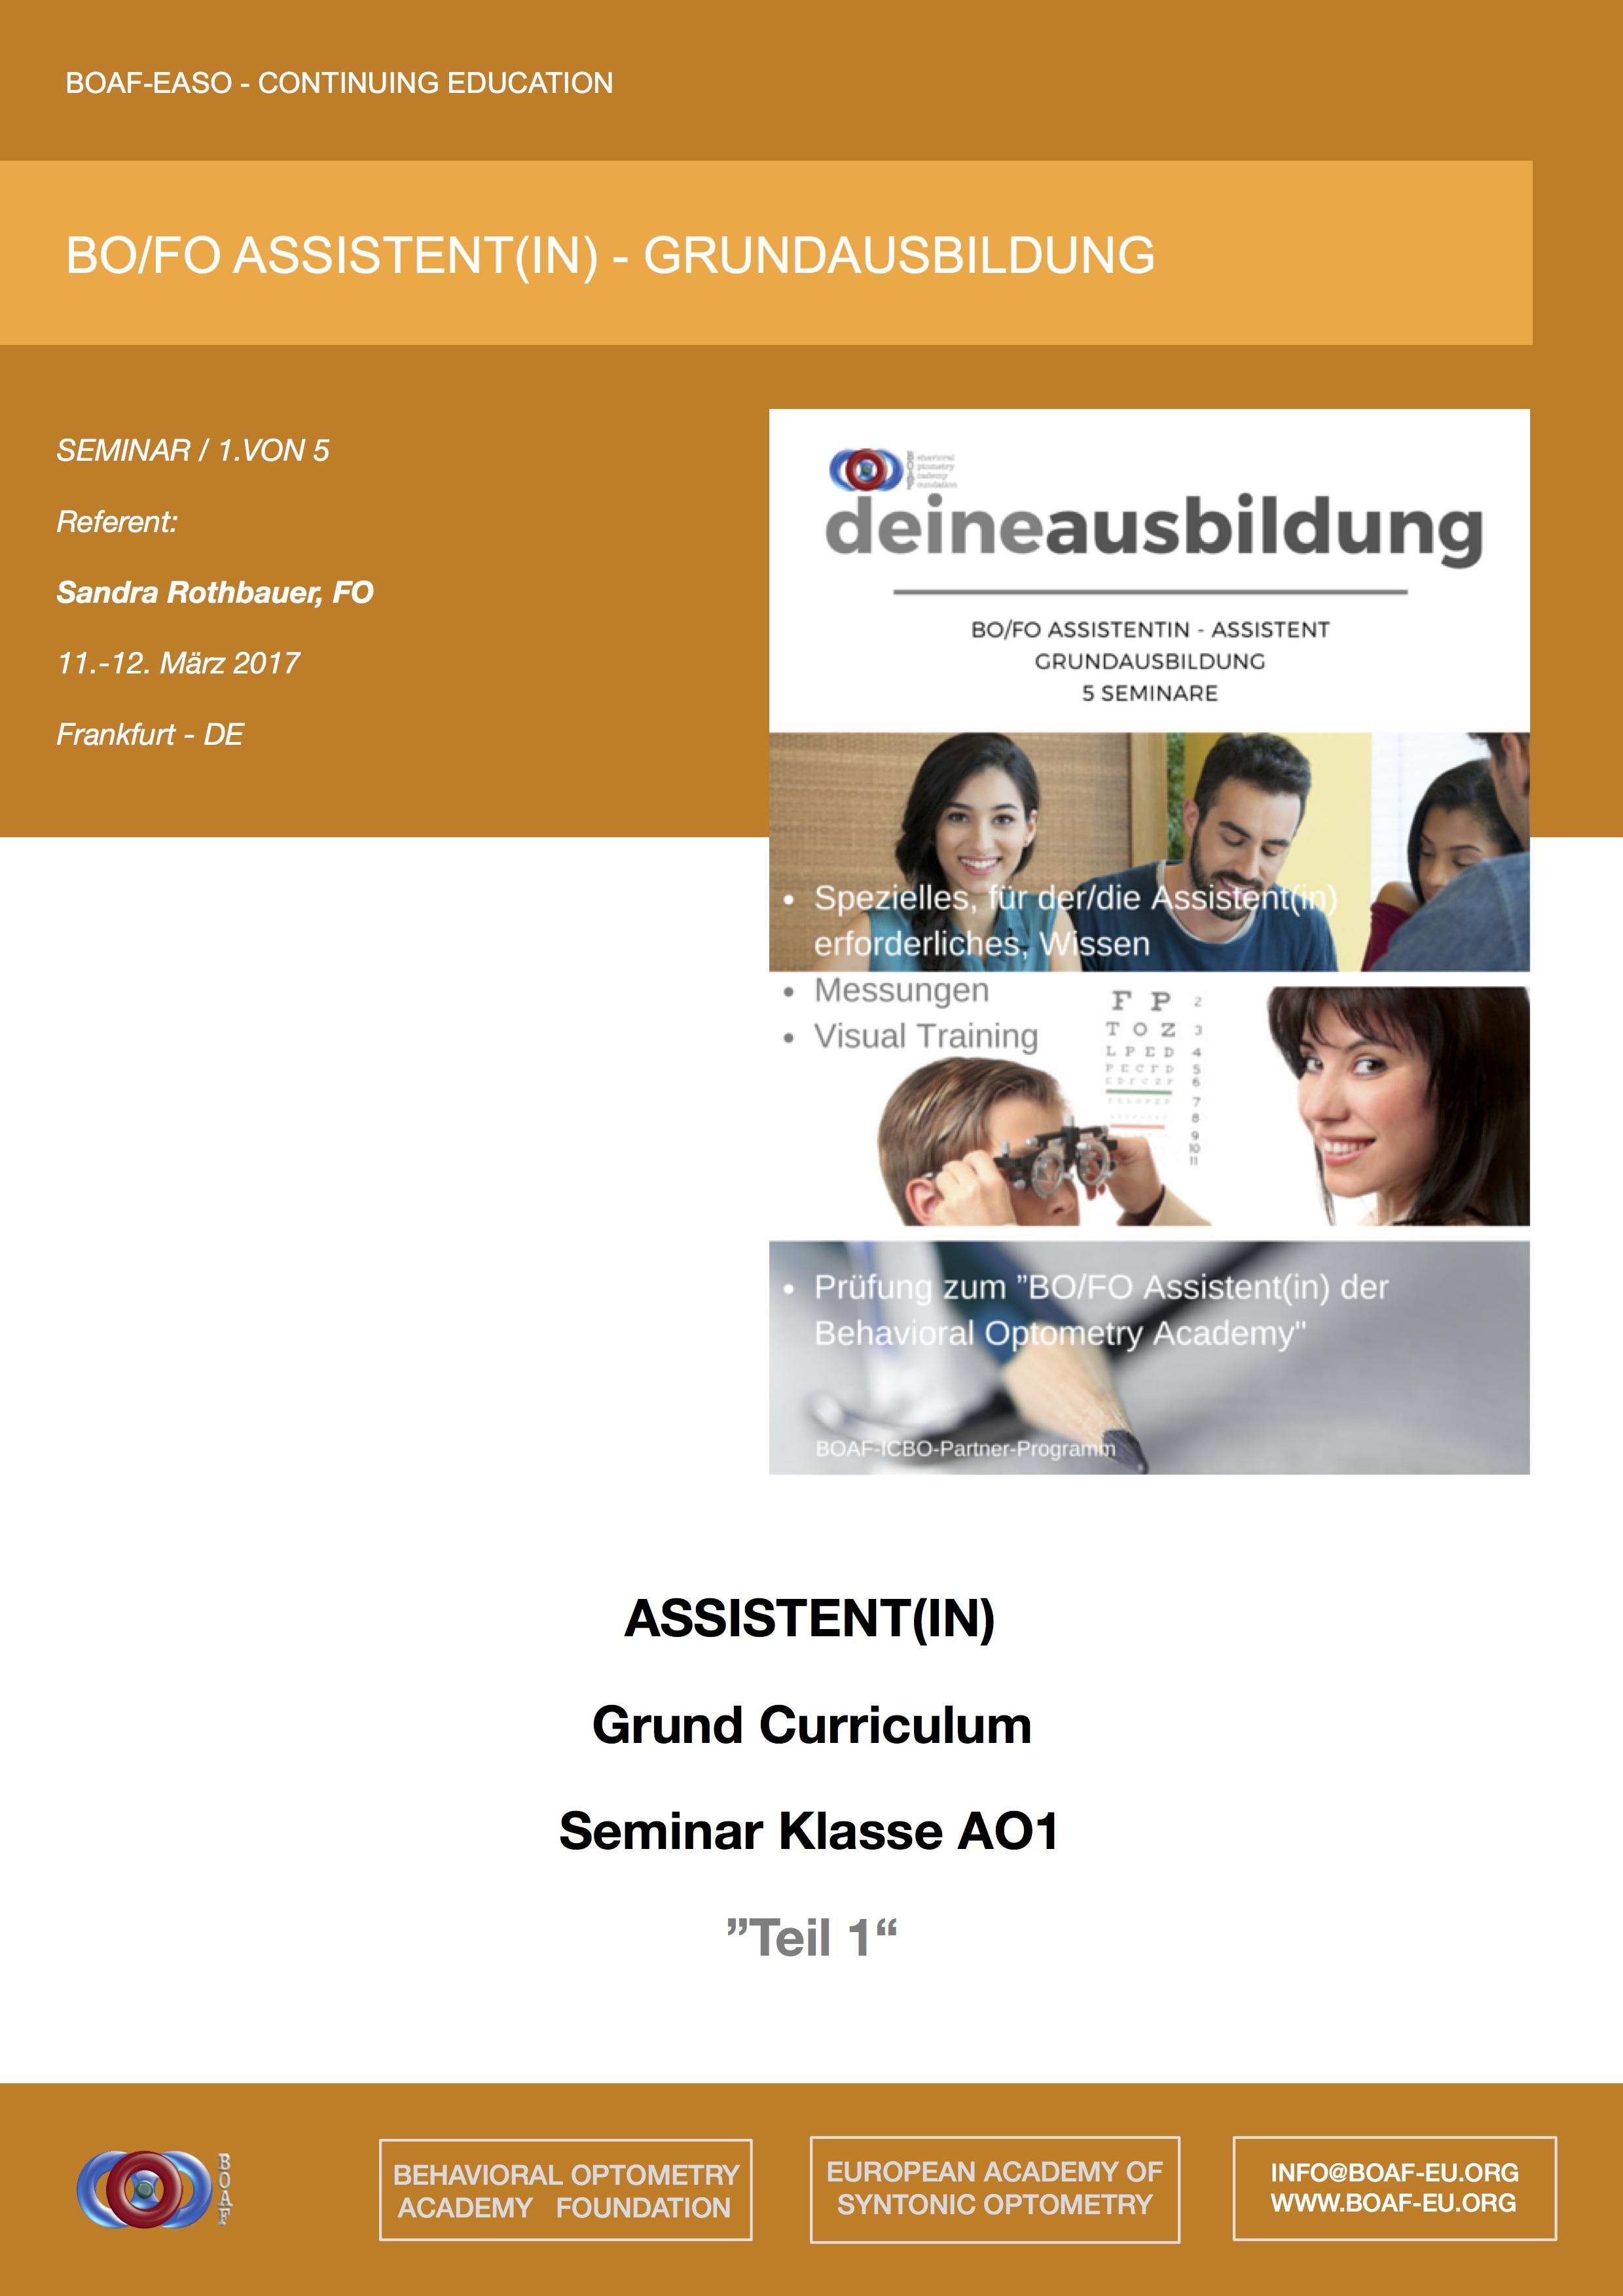 BOAF - Contininung Education Brochure - Basic Curriculum - Online reader -  Link --->